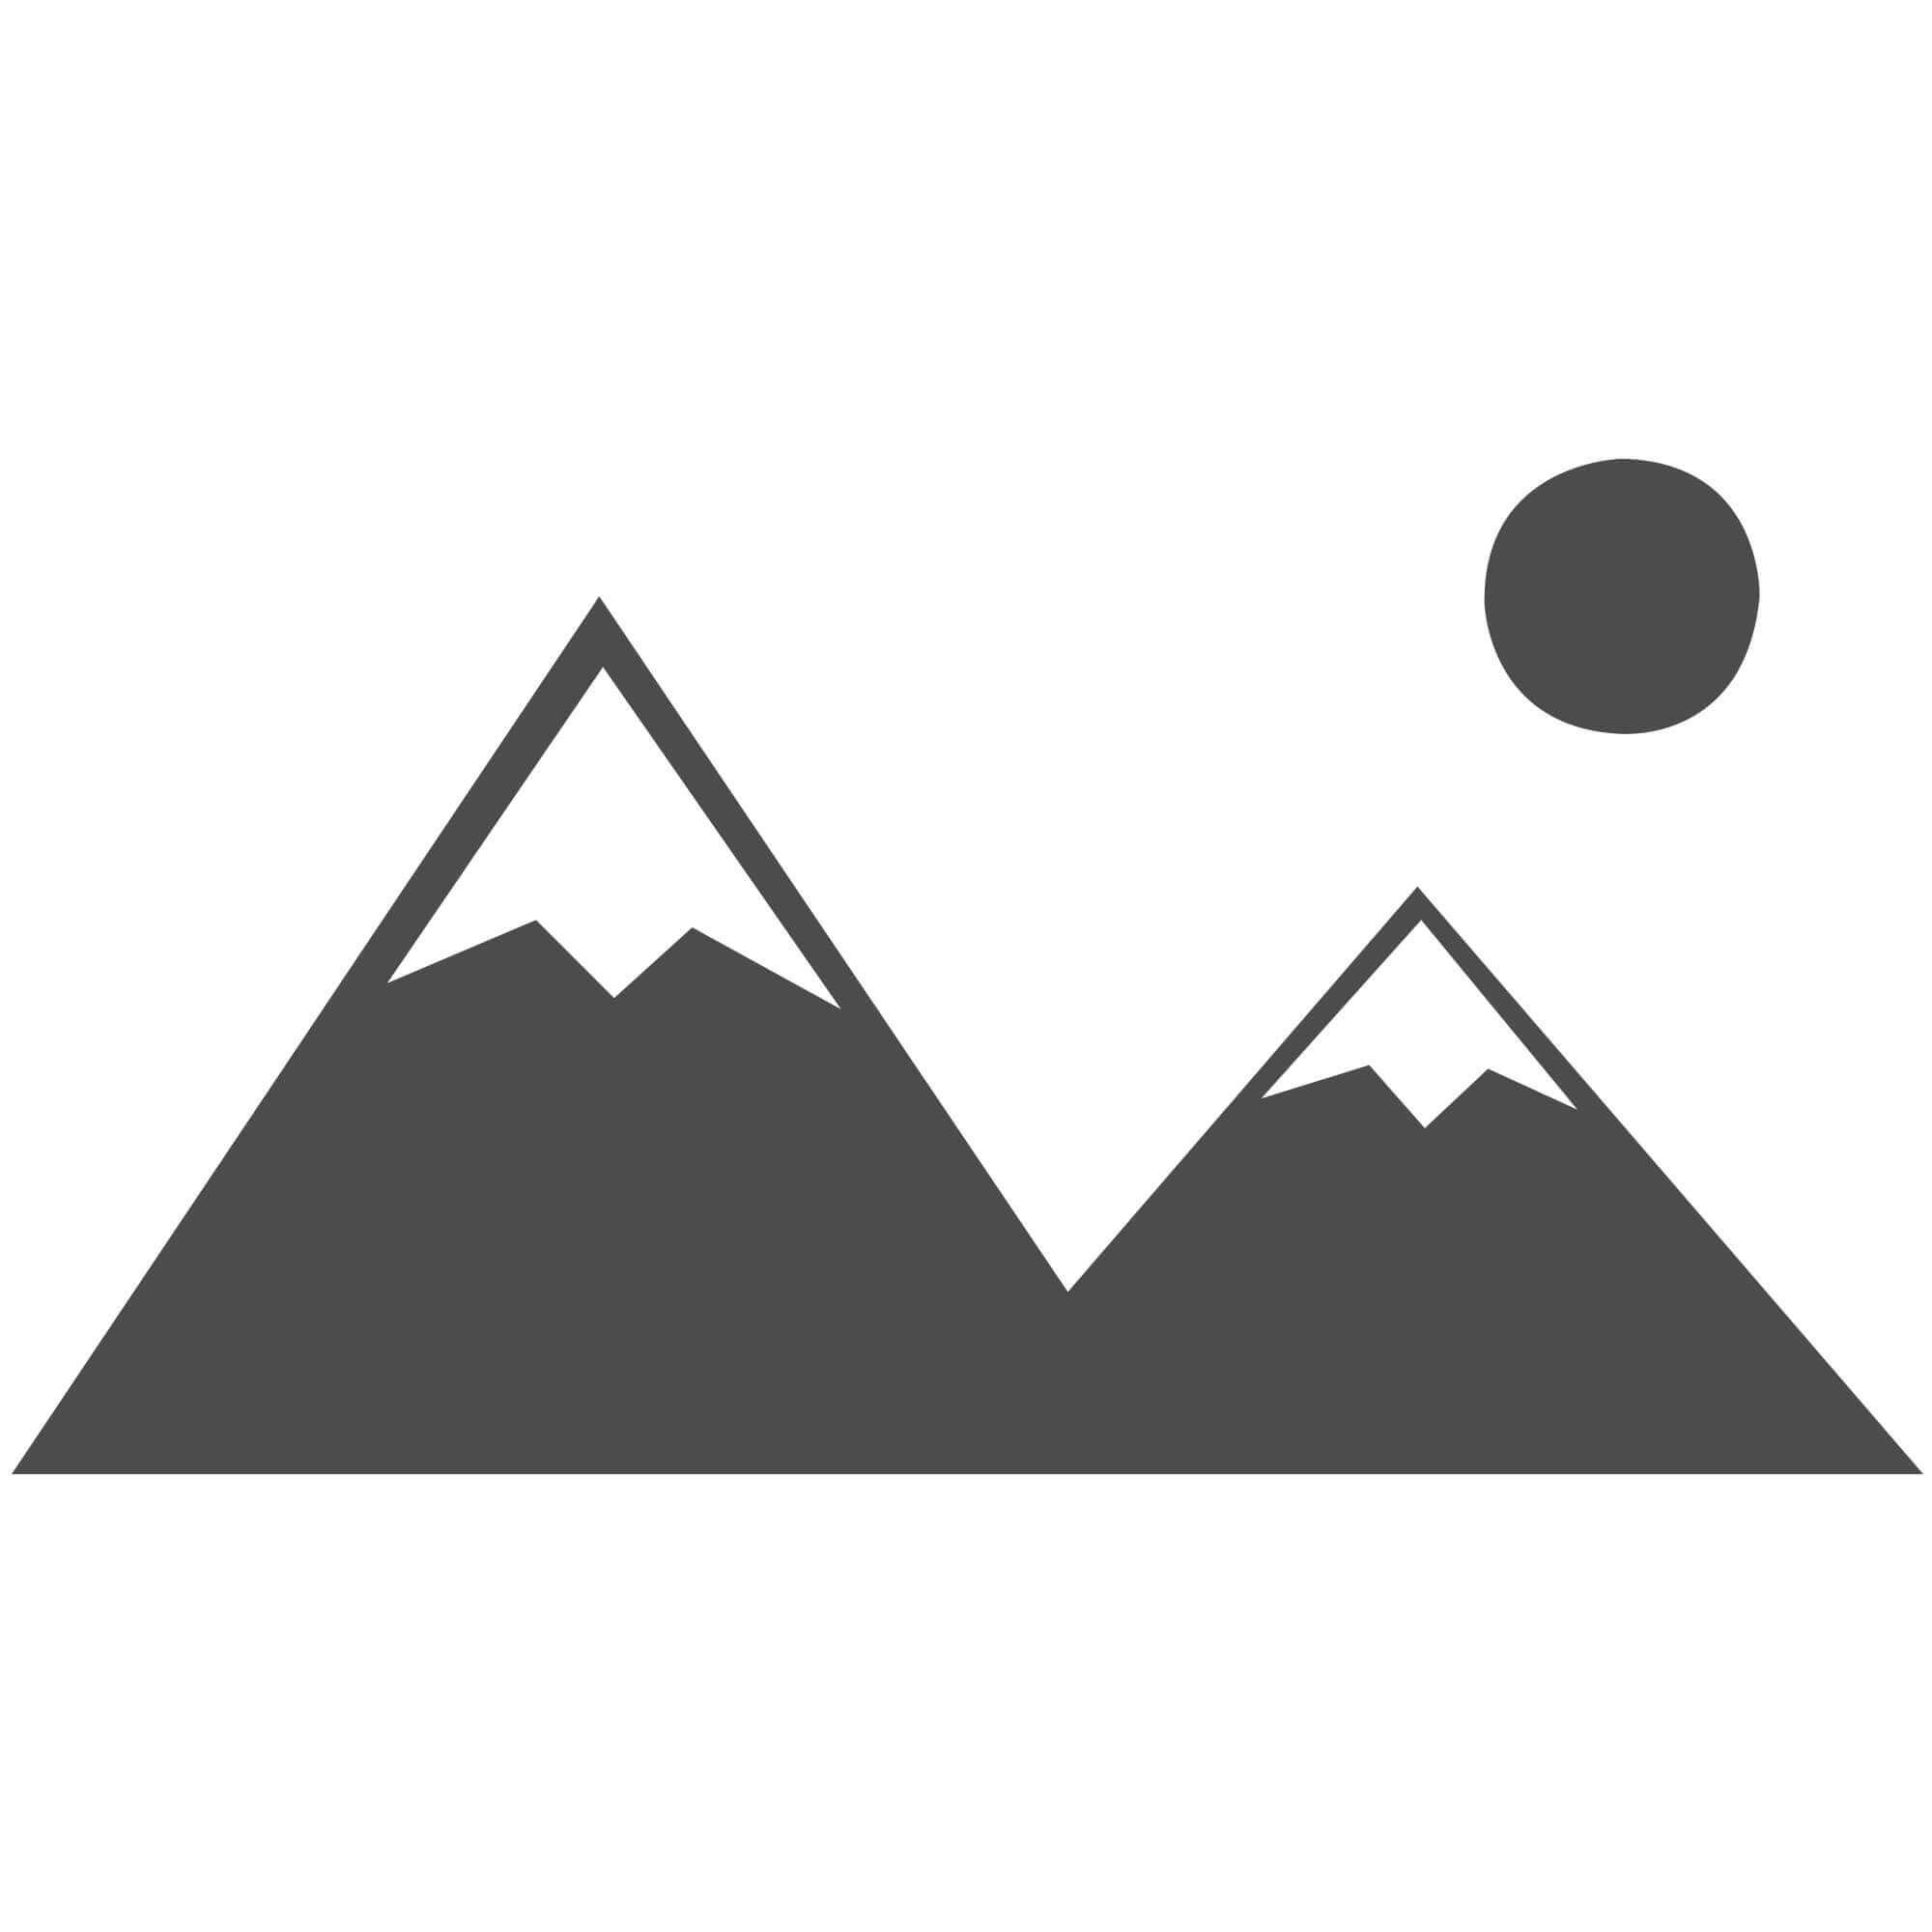 "Infinite Splinter Orange Rug - Size 200 x 290 cm (6'7"" x 9'6"")"